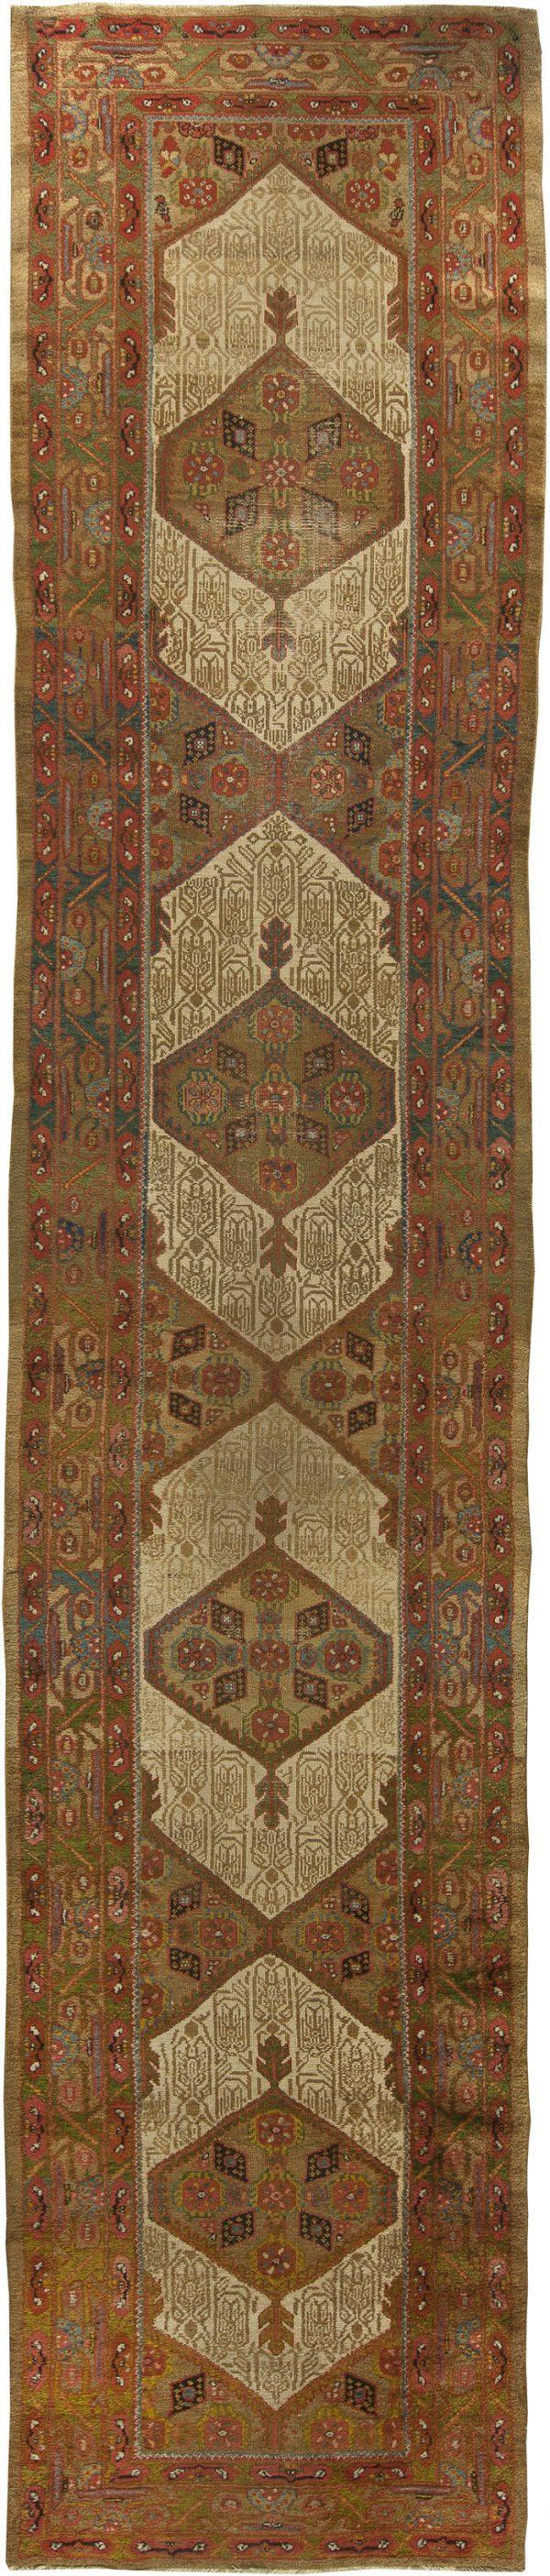 Antique Persian Hamadan Carpet BB3768